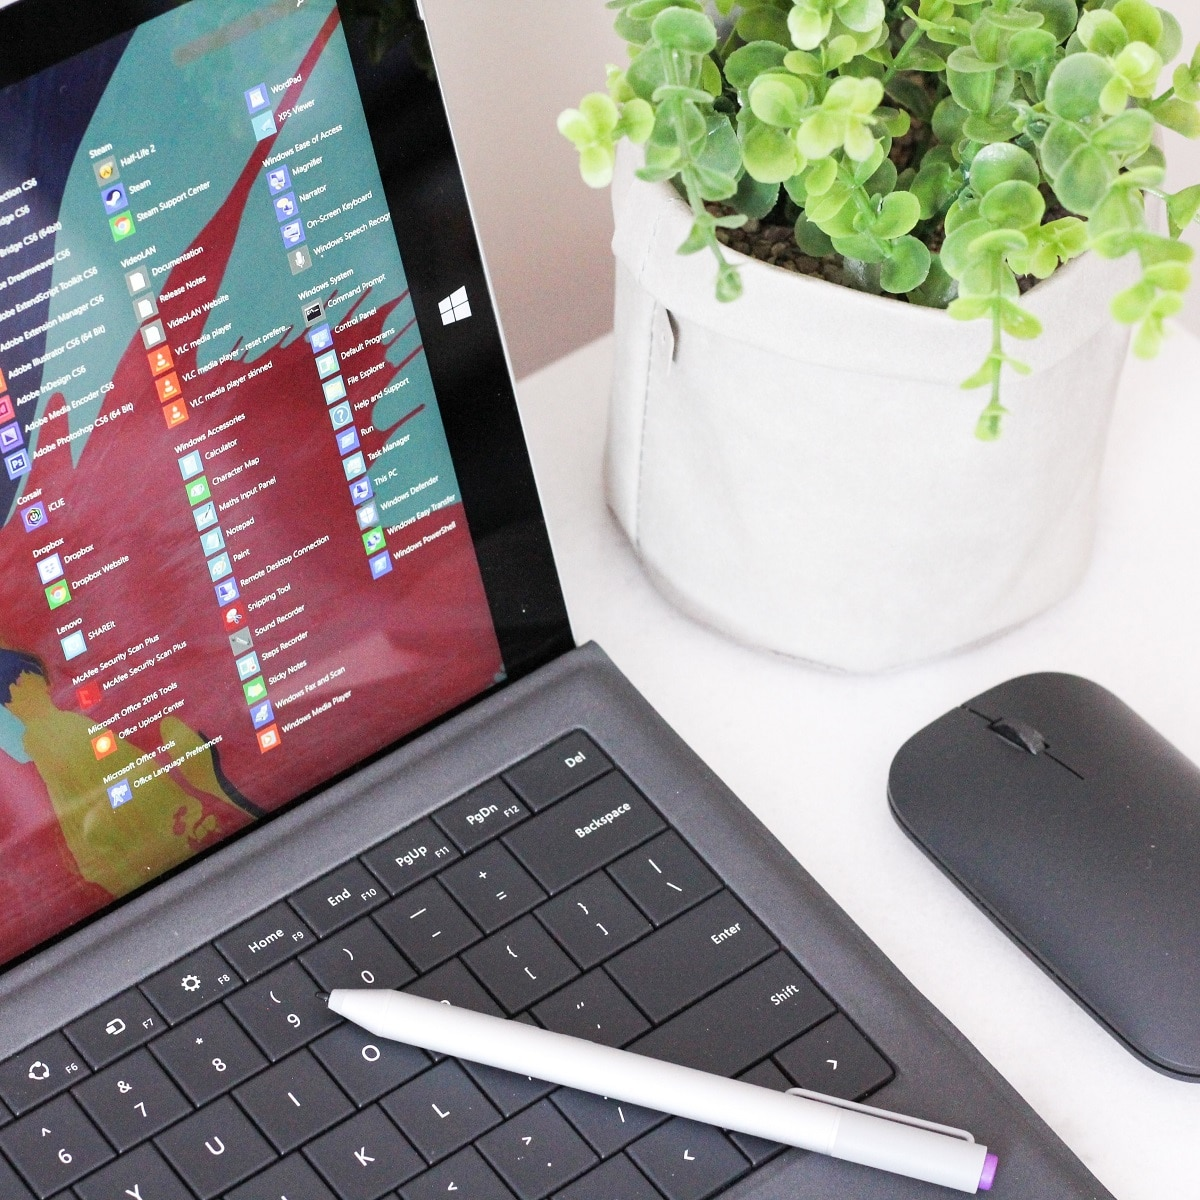 windows 10 start menu featured image